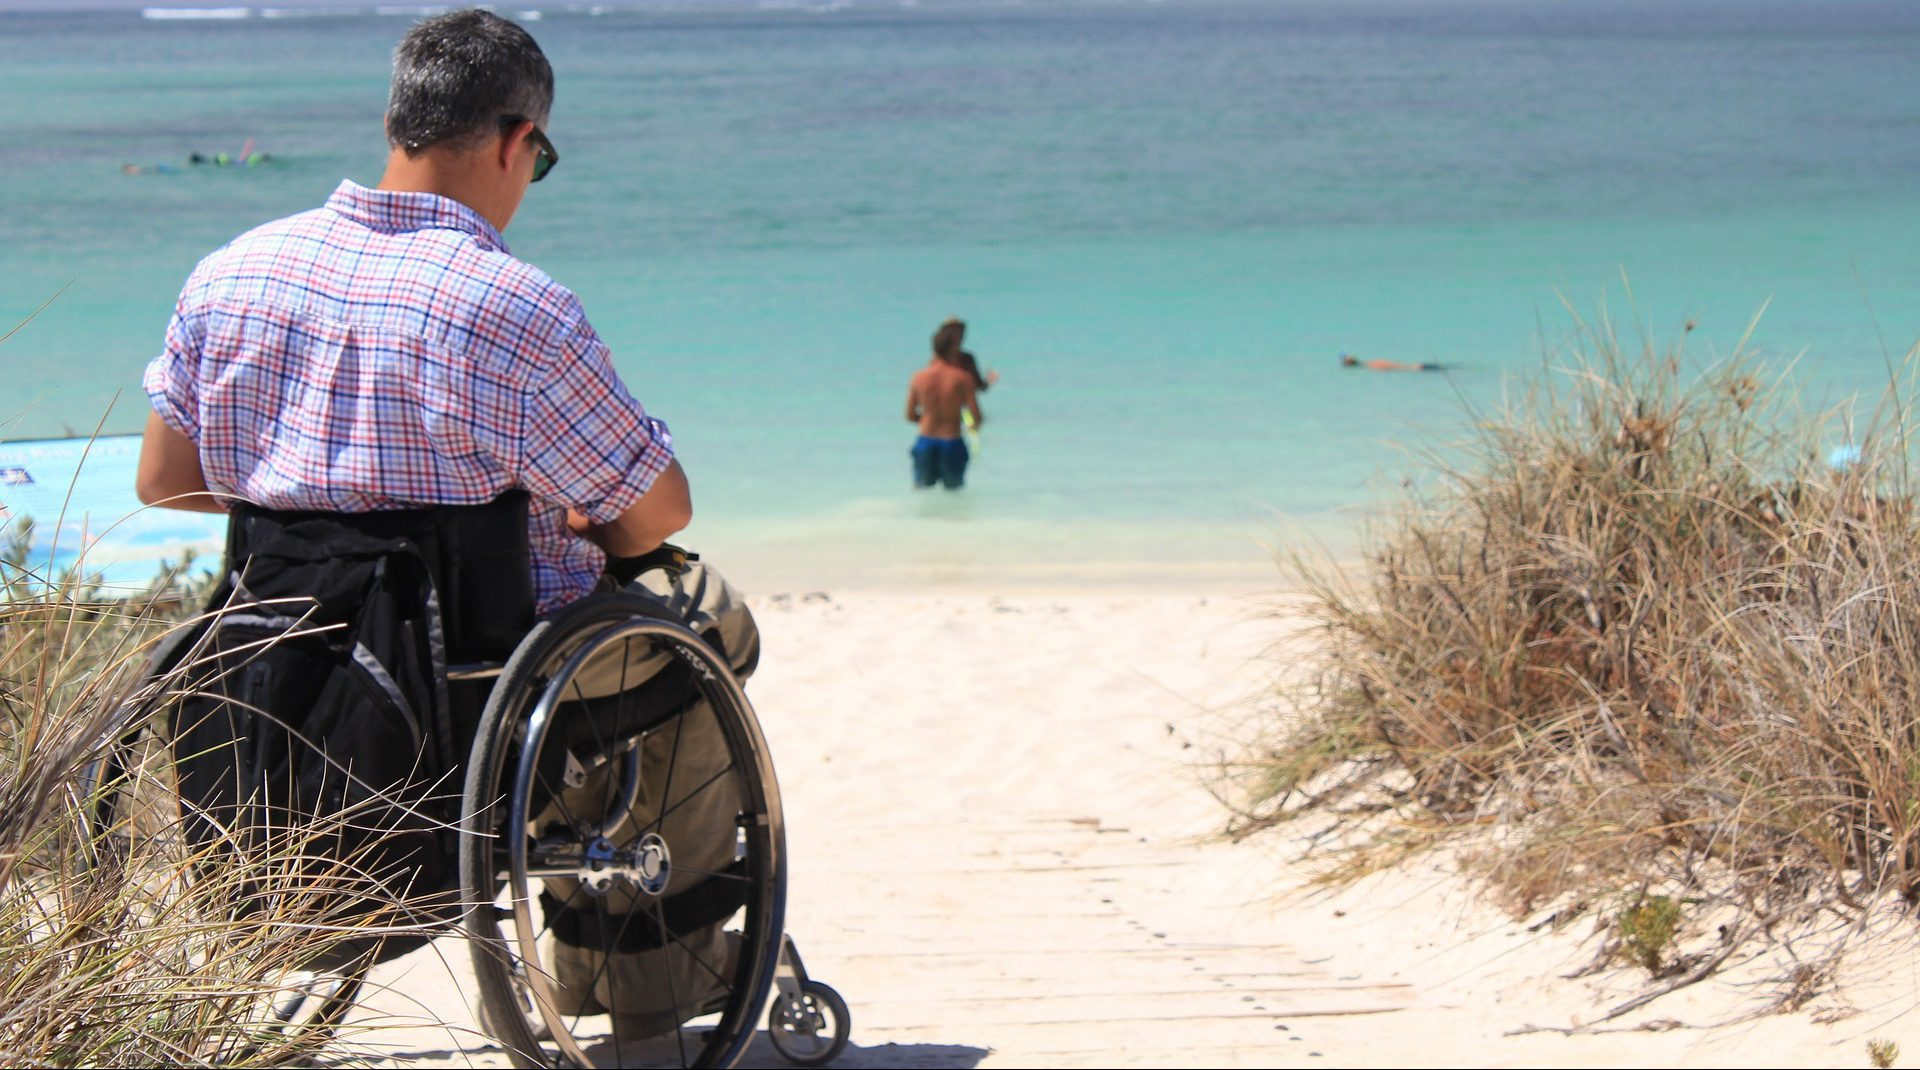 Kreuzfahrt mit Rollstuhl